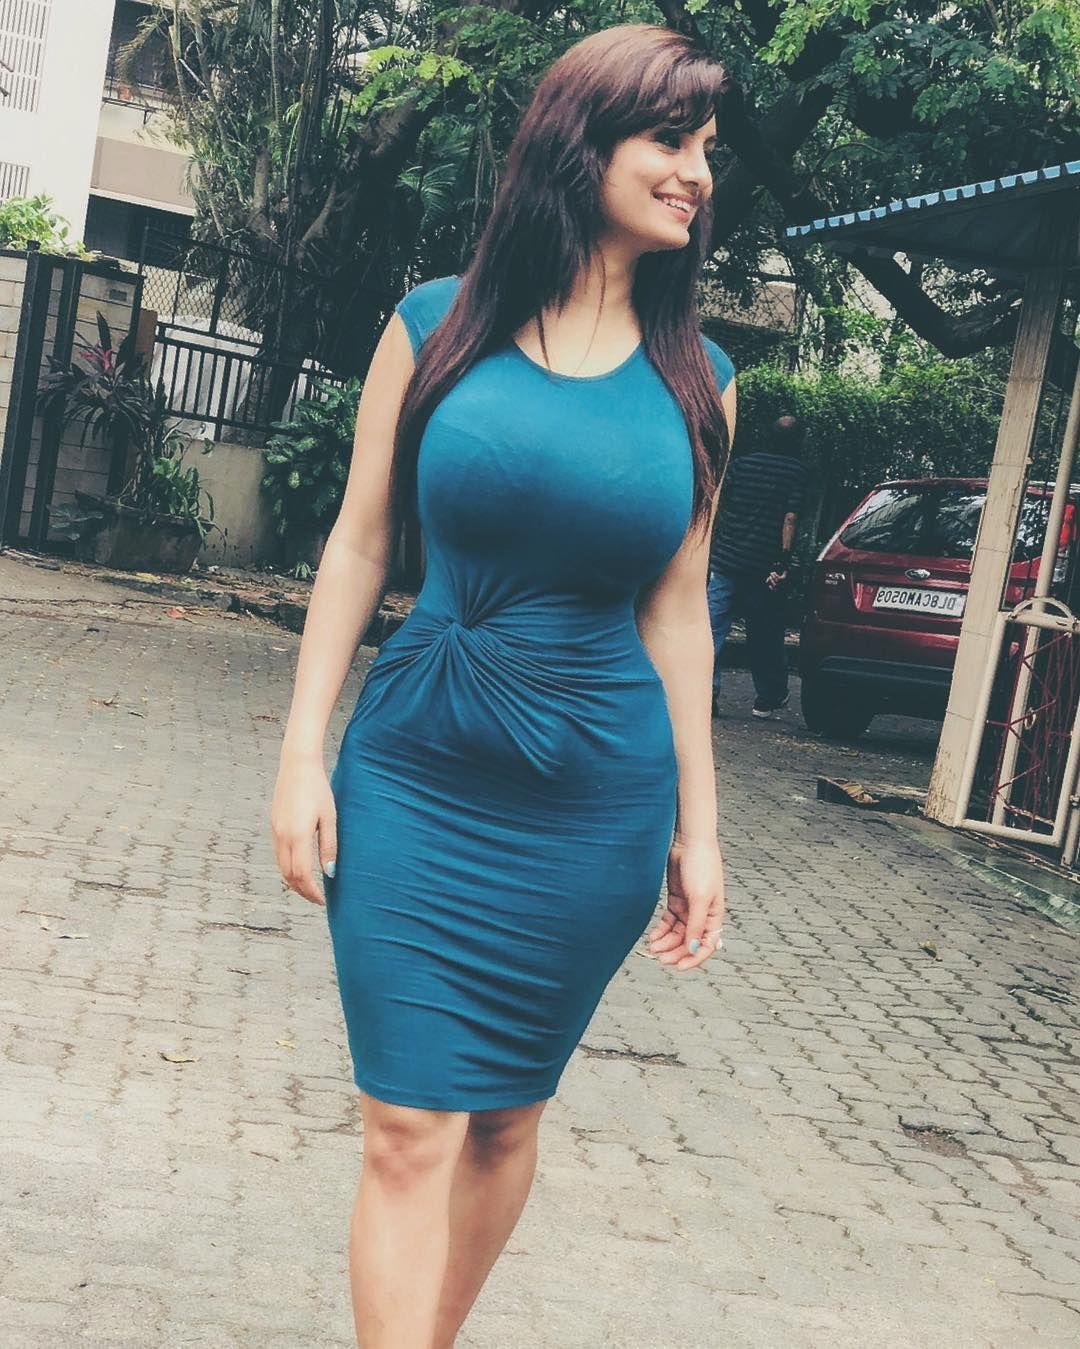 "12 HOT PICTURES OF ""ANVESHI JAIN"" – GANDI BAAT: 2 HOT ACTRESS | Indian models, Indian celebrities, Hot actresses"